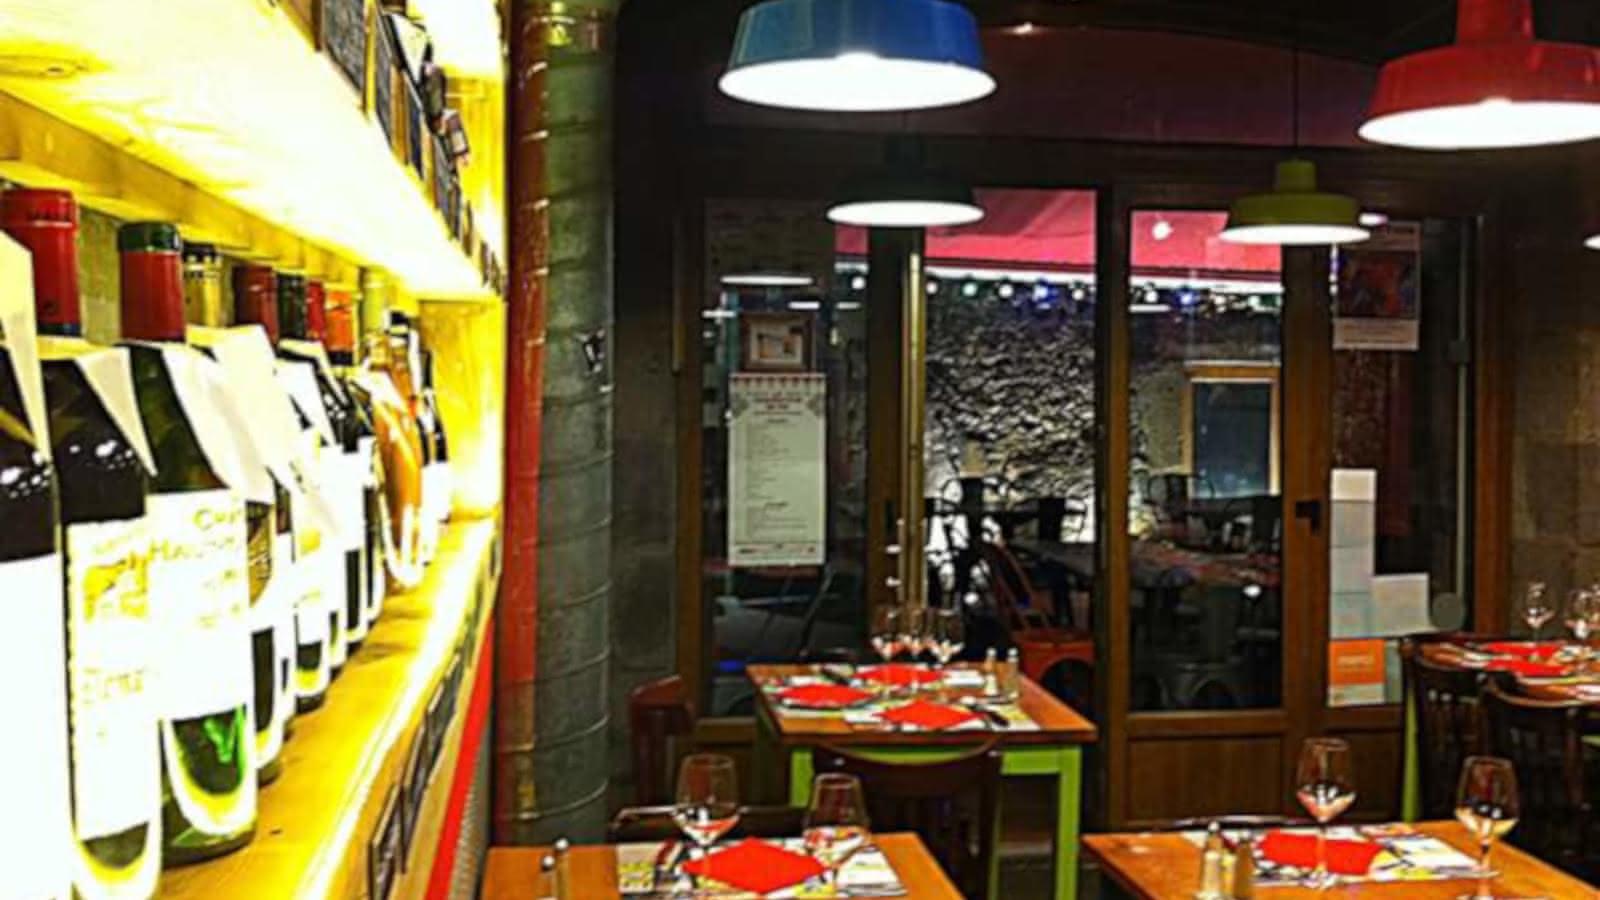 © Salle - Restaurant - Le Boeuf Café